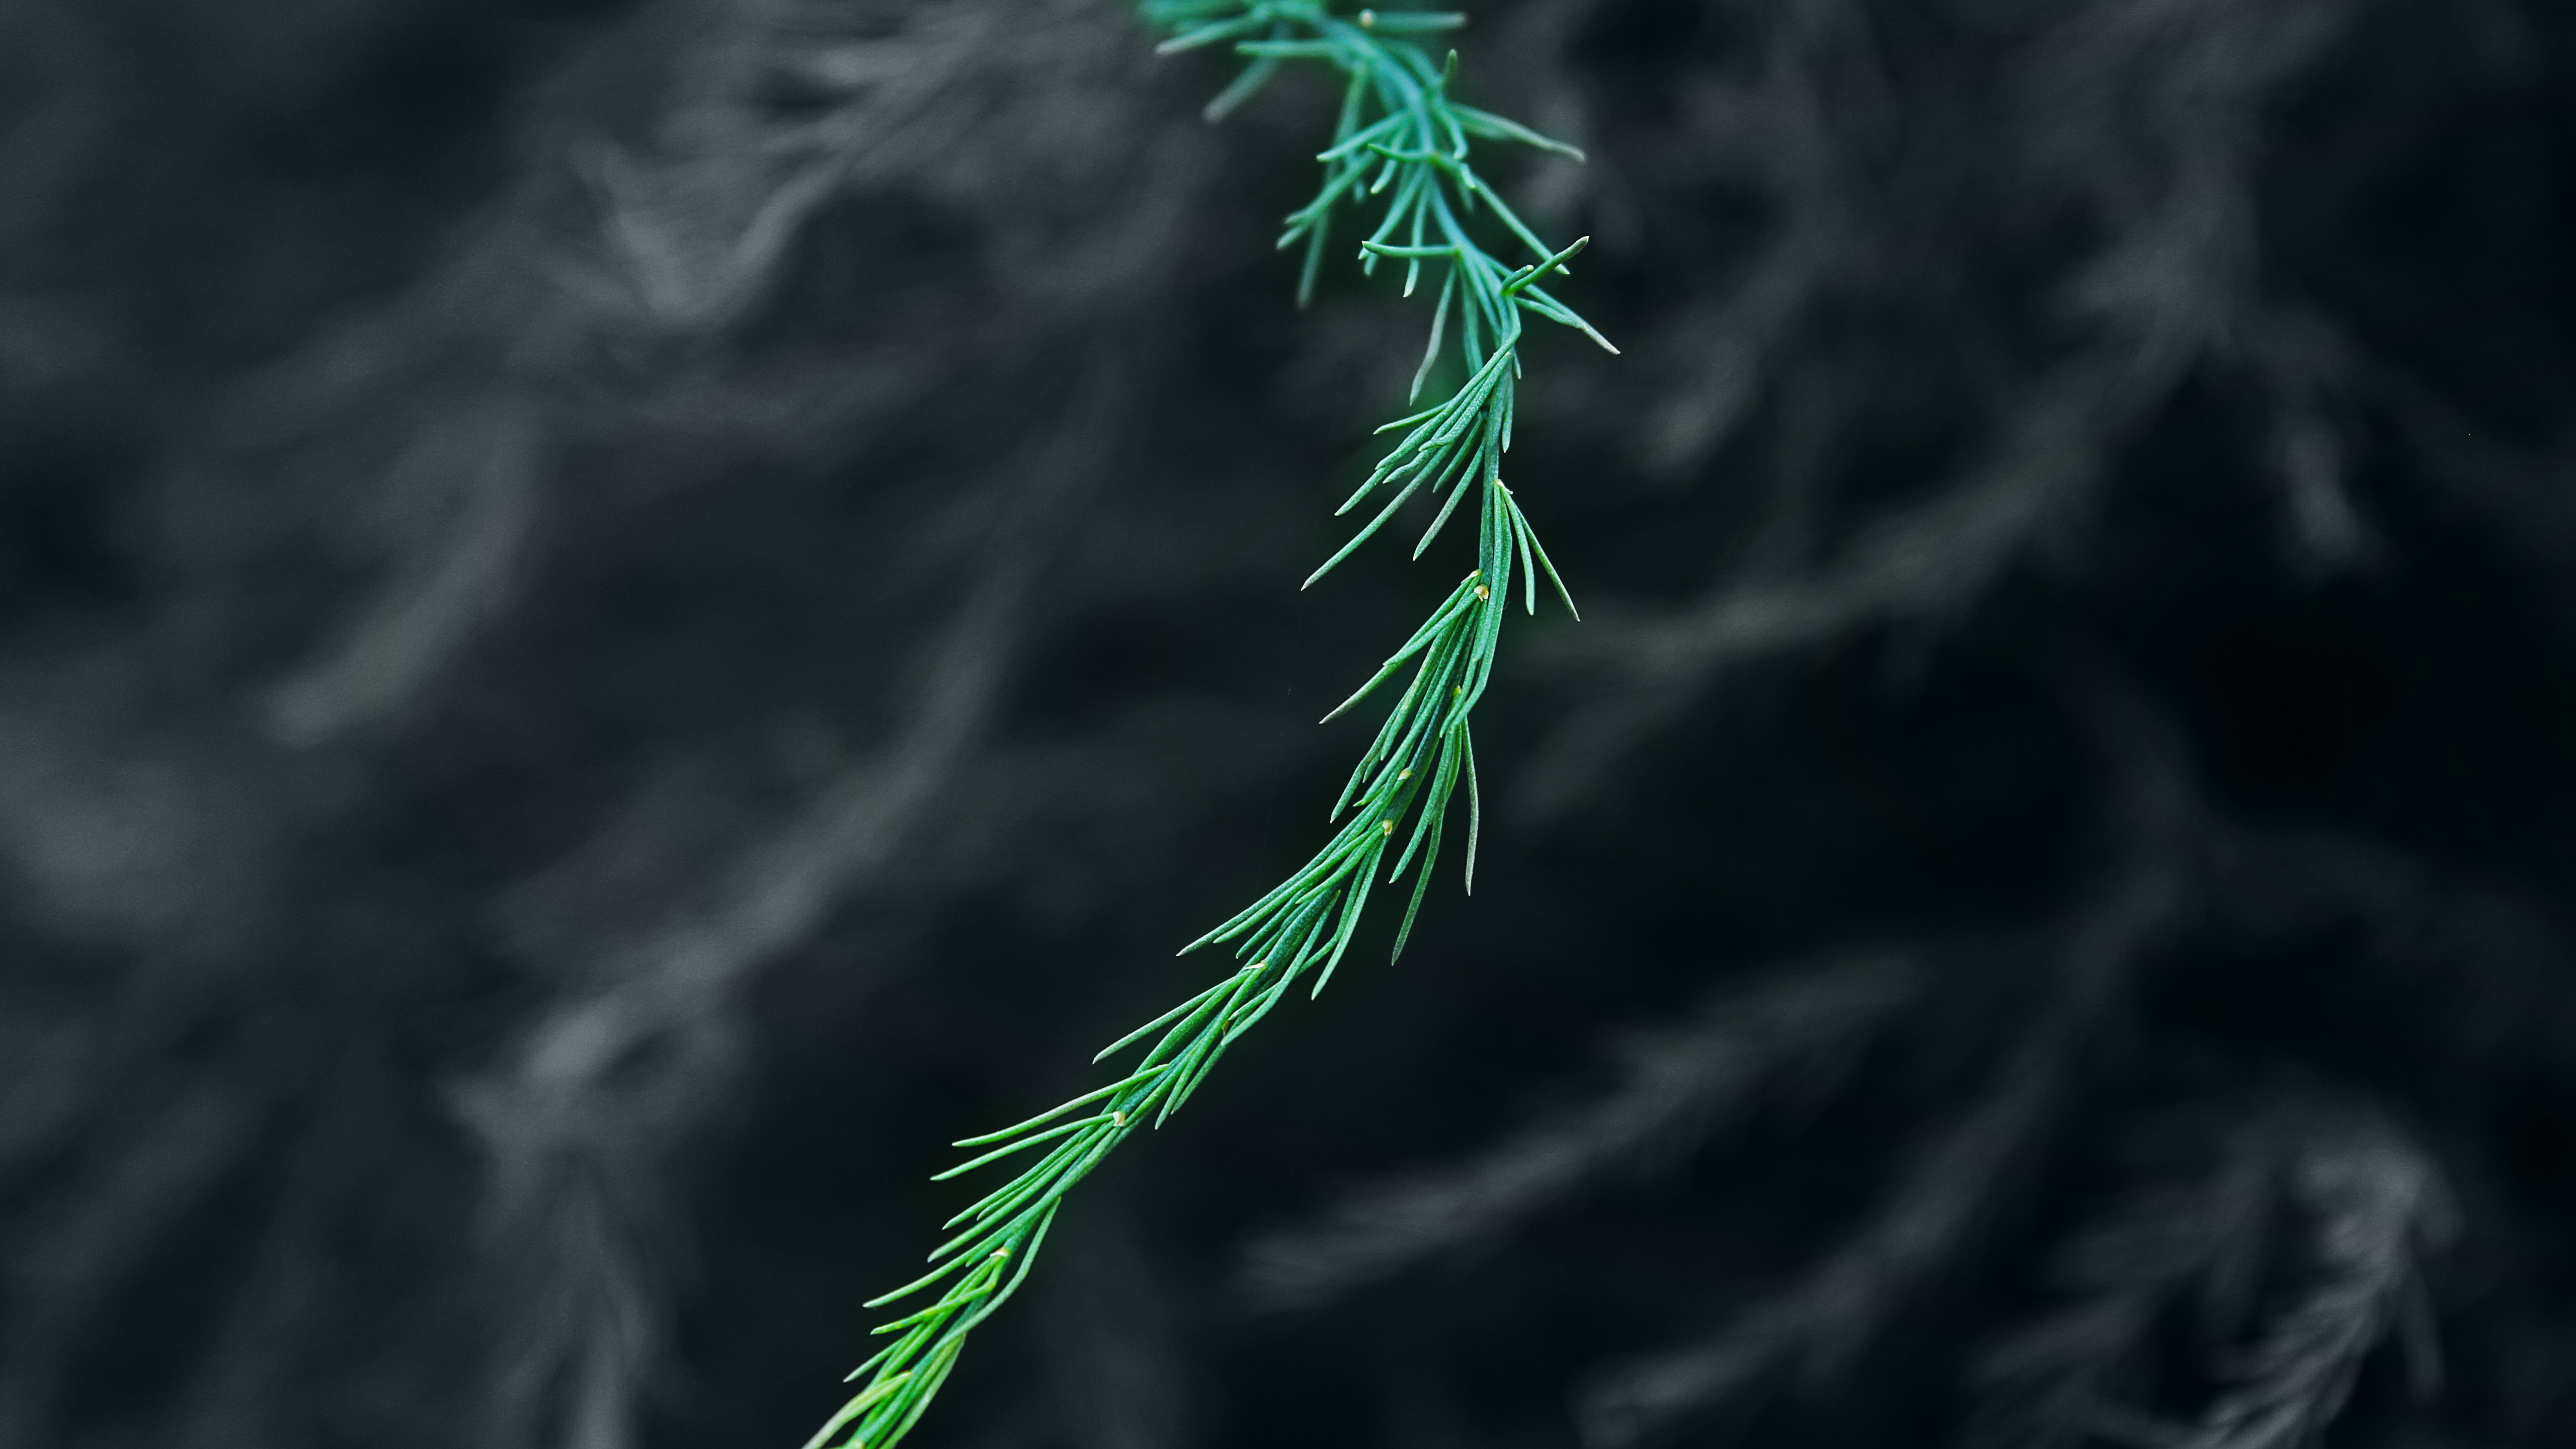 Green Bush Blur 5k, HD Nature, 4k Wallpapers, Images